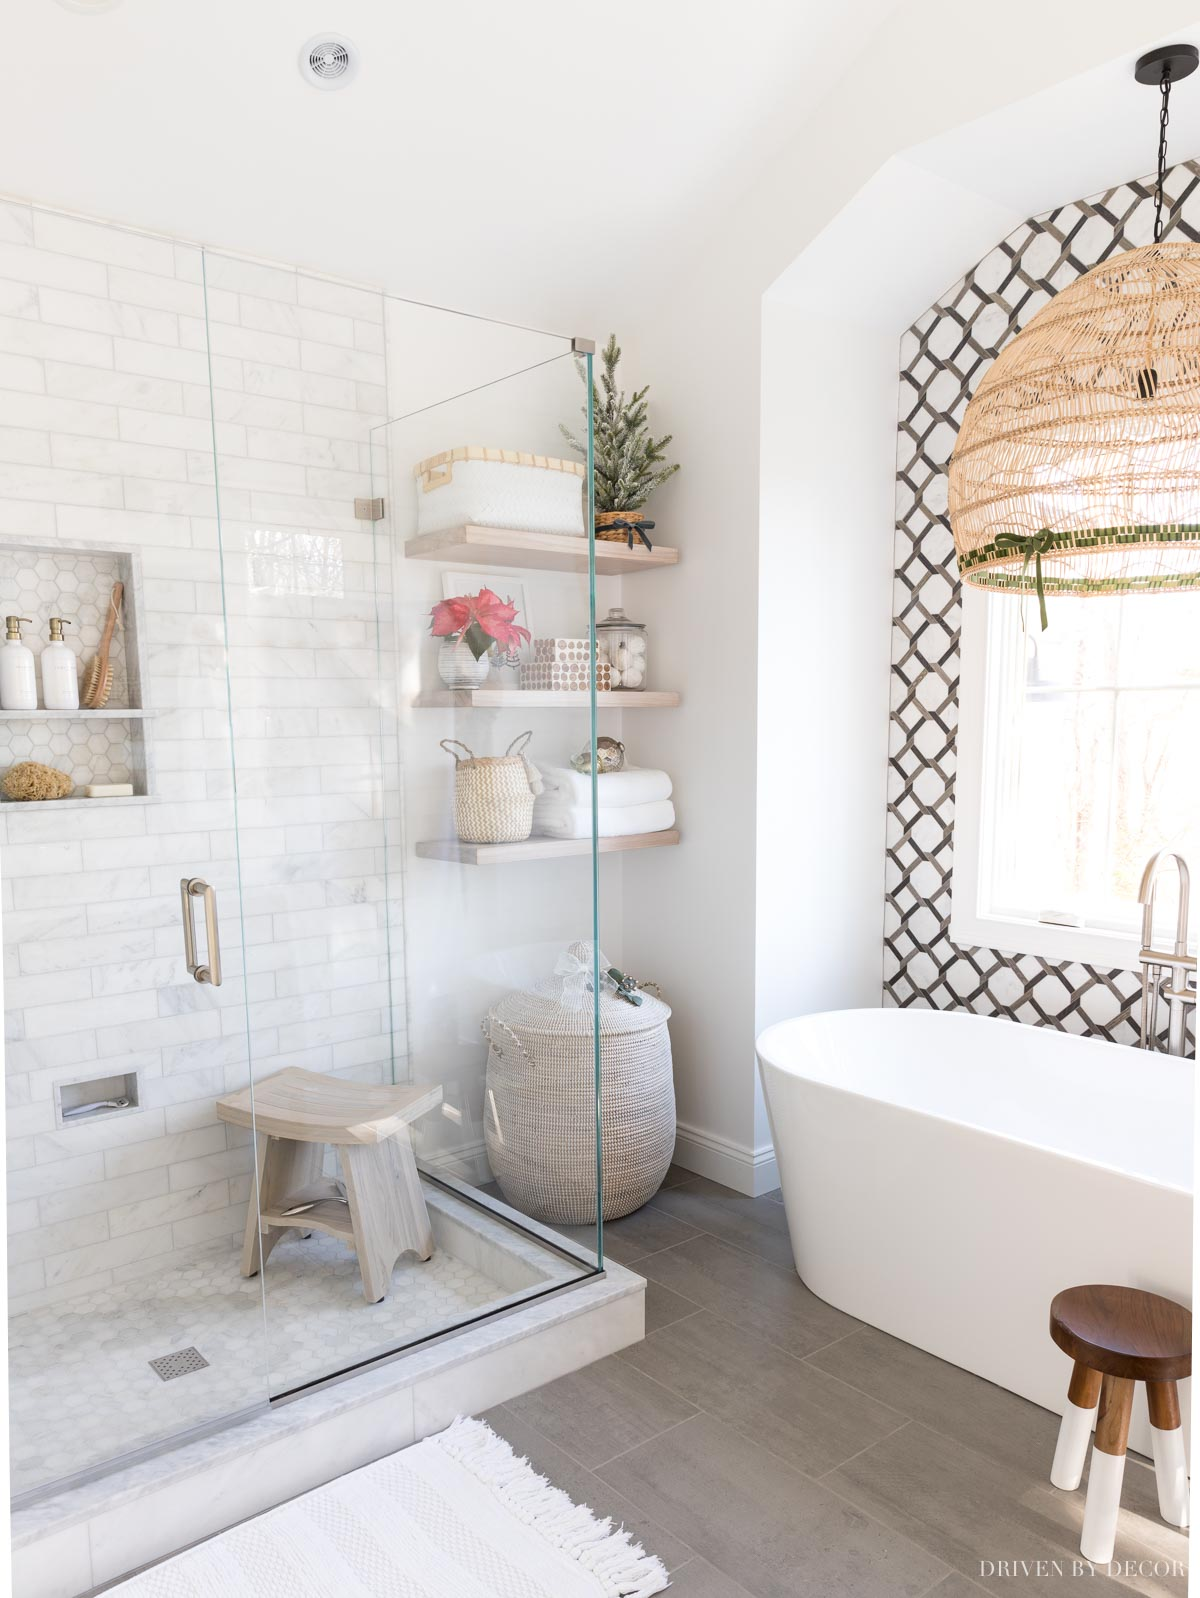 Master Bathroom Ideas My 10 Favorites Driven By Decor